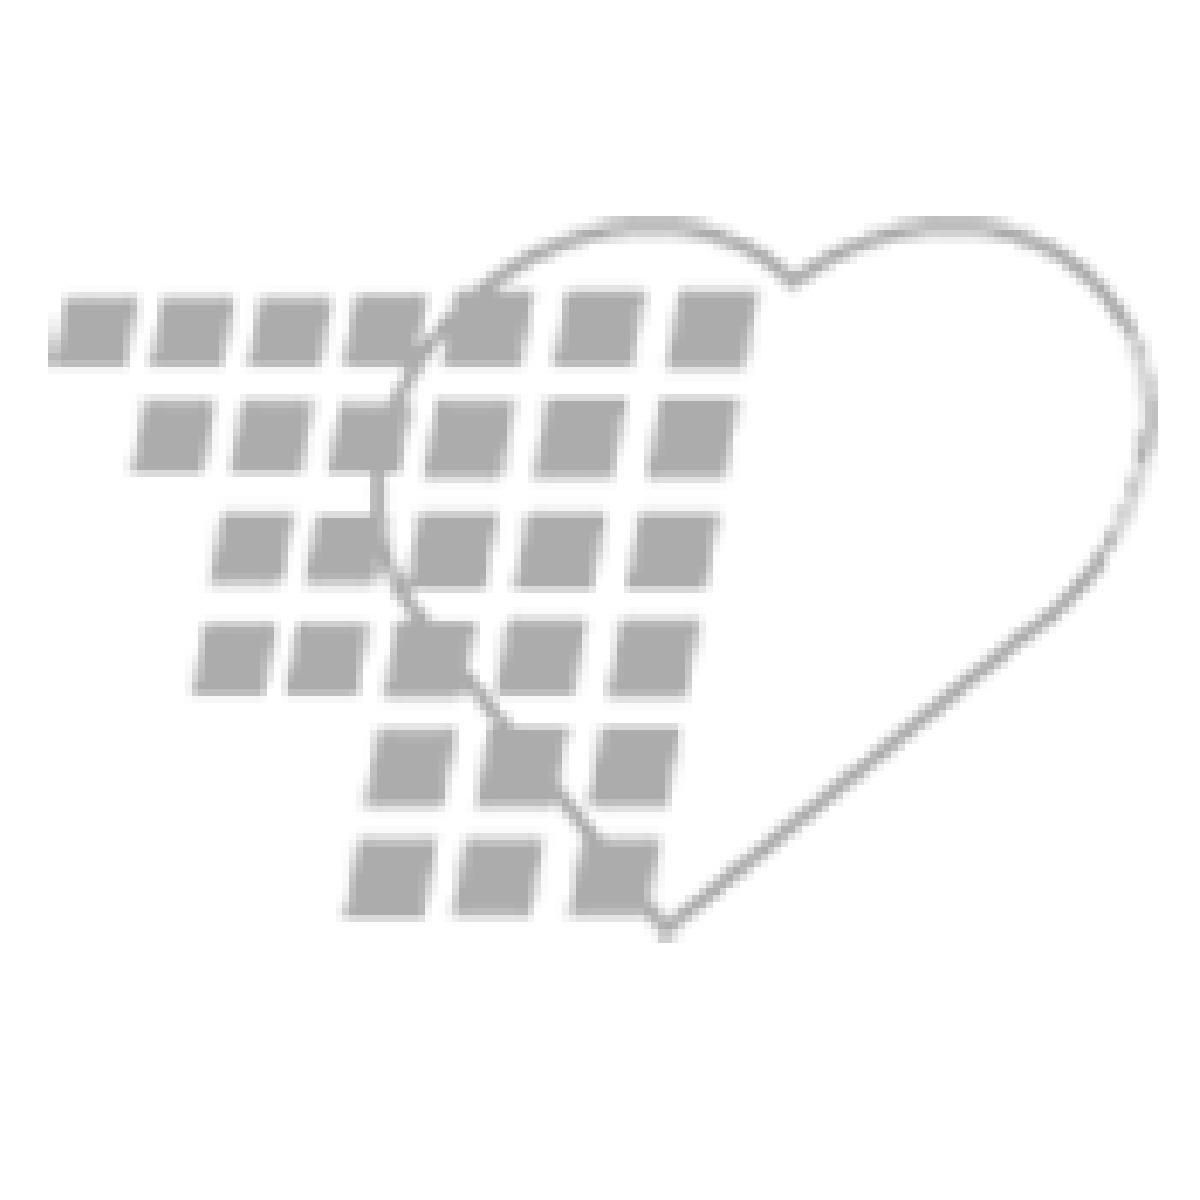 11-99-2121 Laerdal Tibial IO Pad